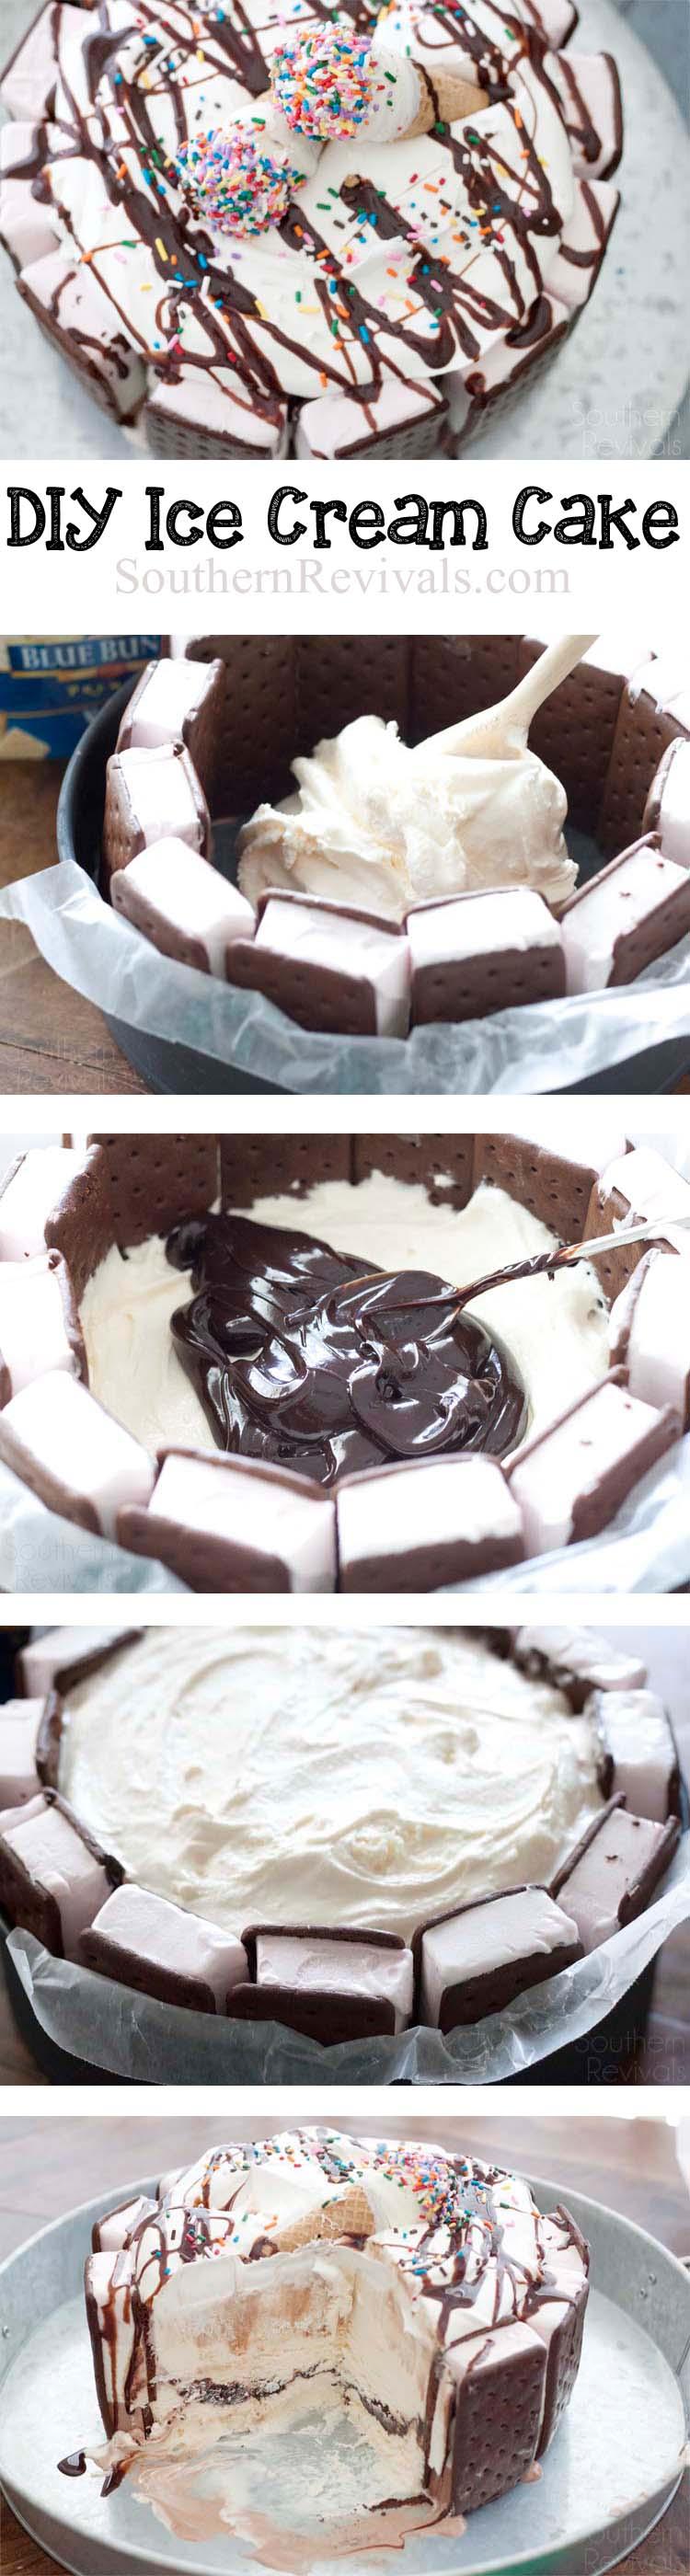 3-Layer DIY Ice Cream Cake